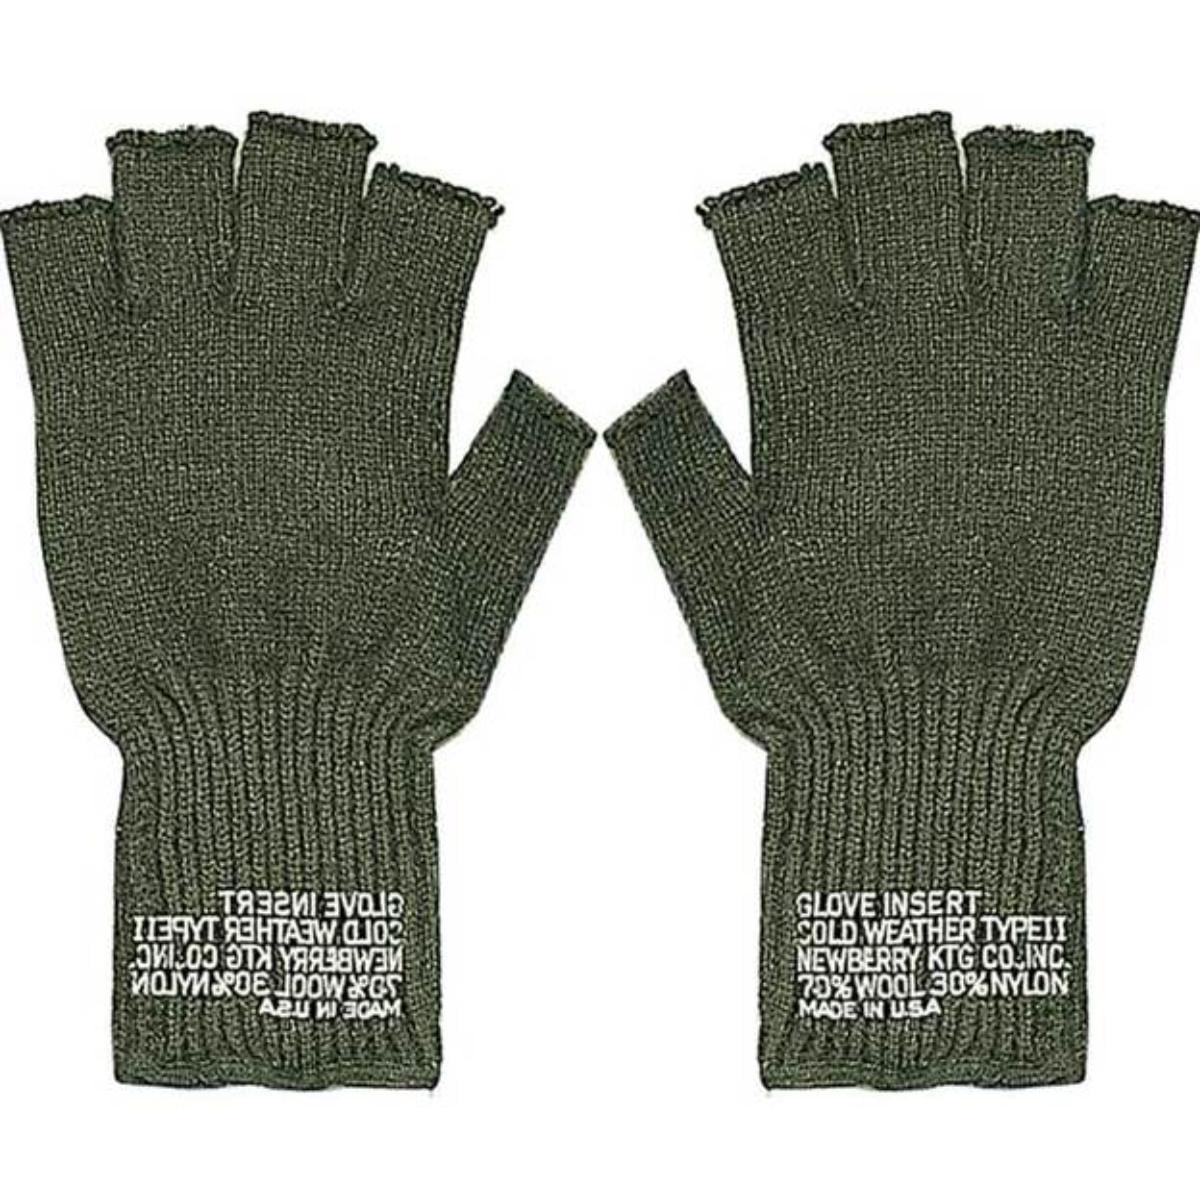 New G.I. Wool Fingerless Glove, Black or Olive Drab